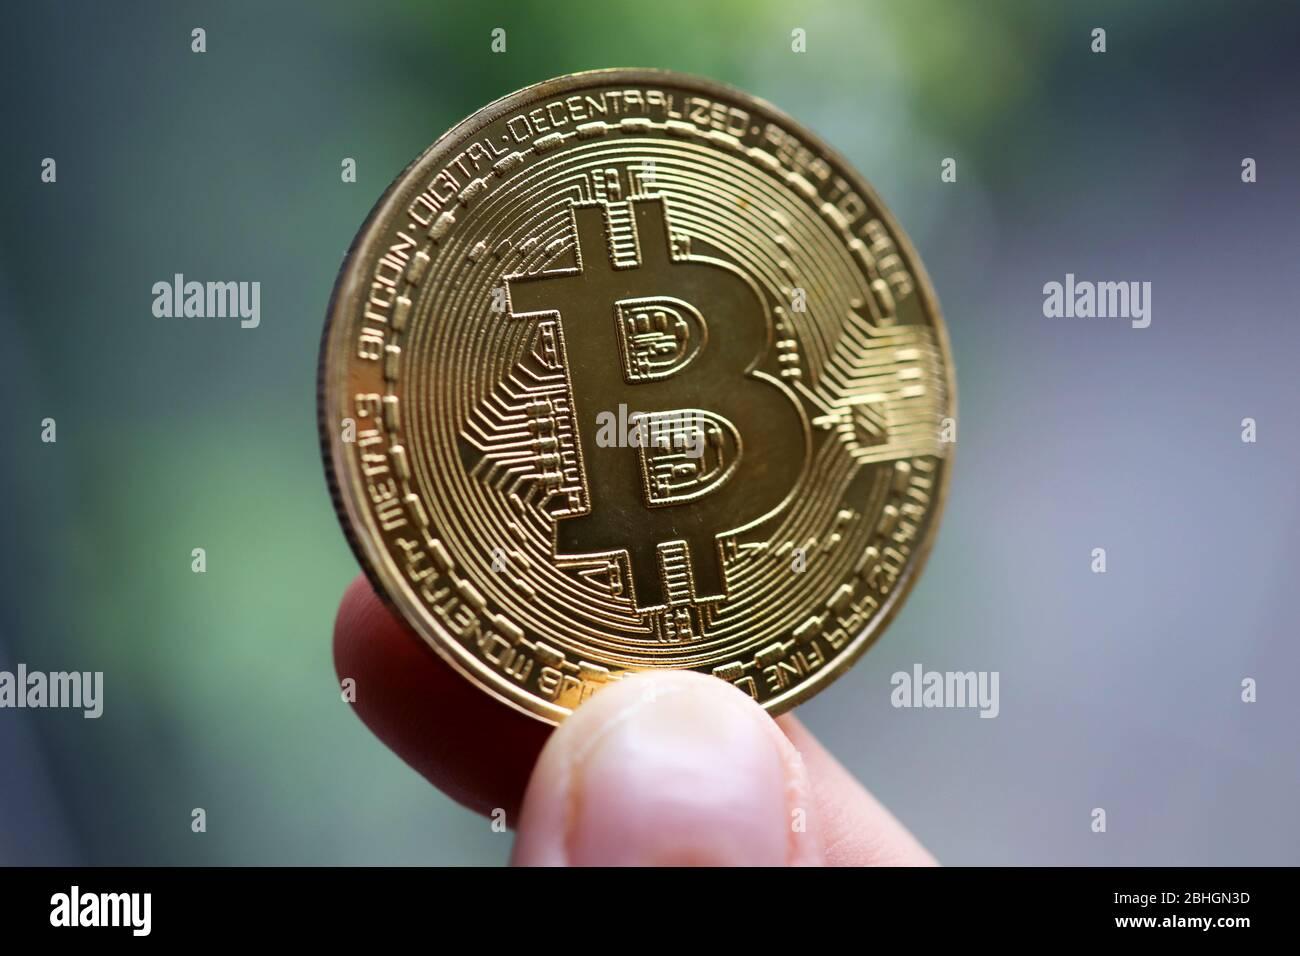 Uk crypto currency stocks betting expert tennis wta 2021